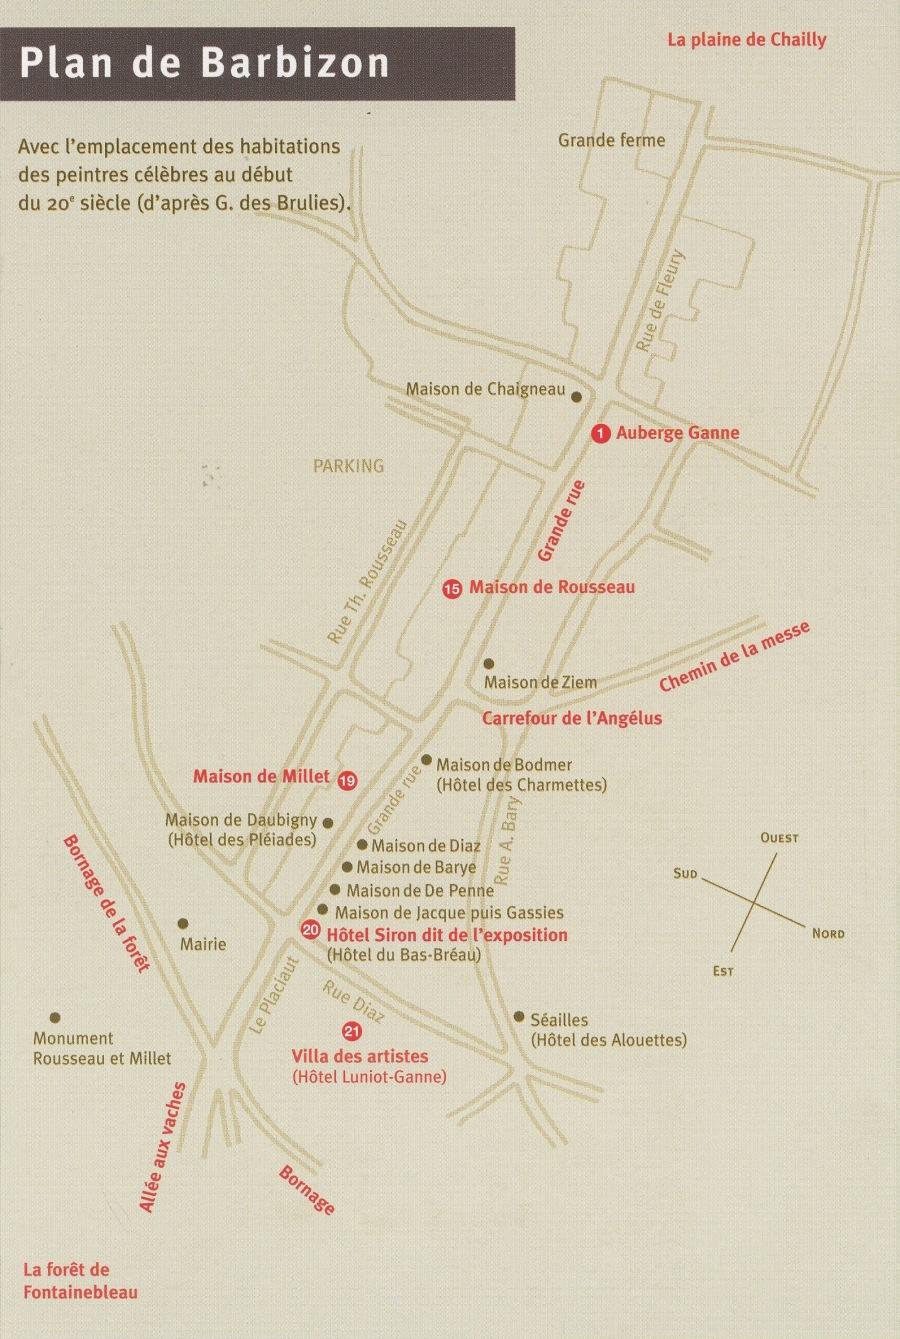 Plan Habitations des peintres